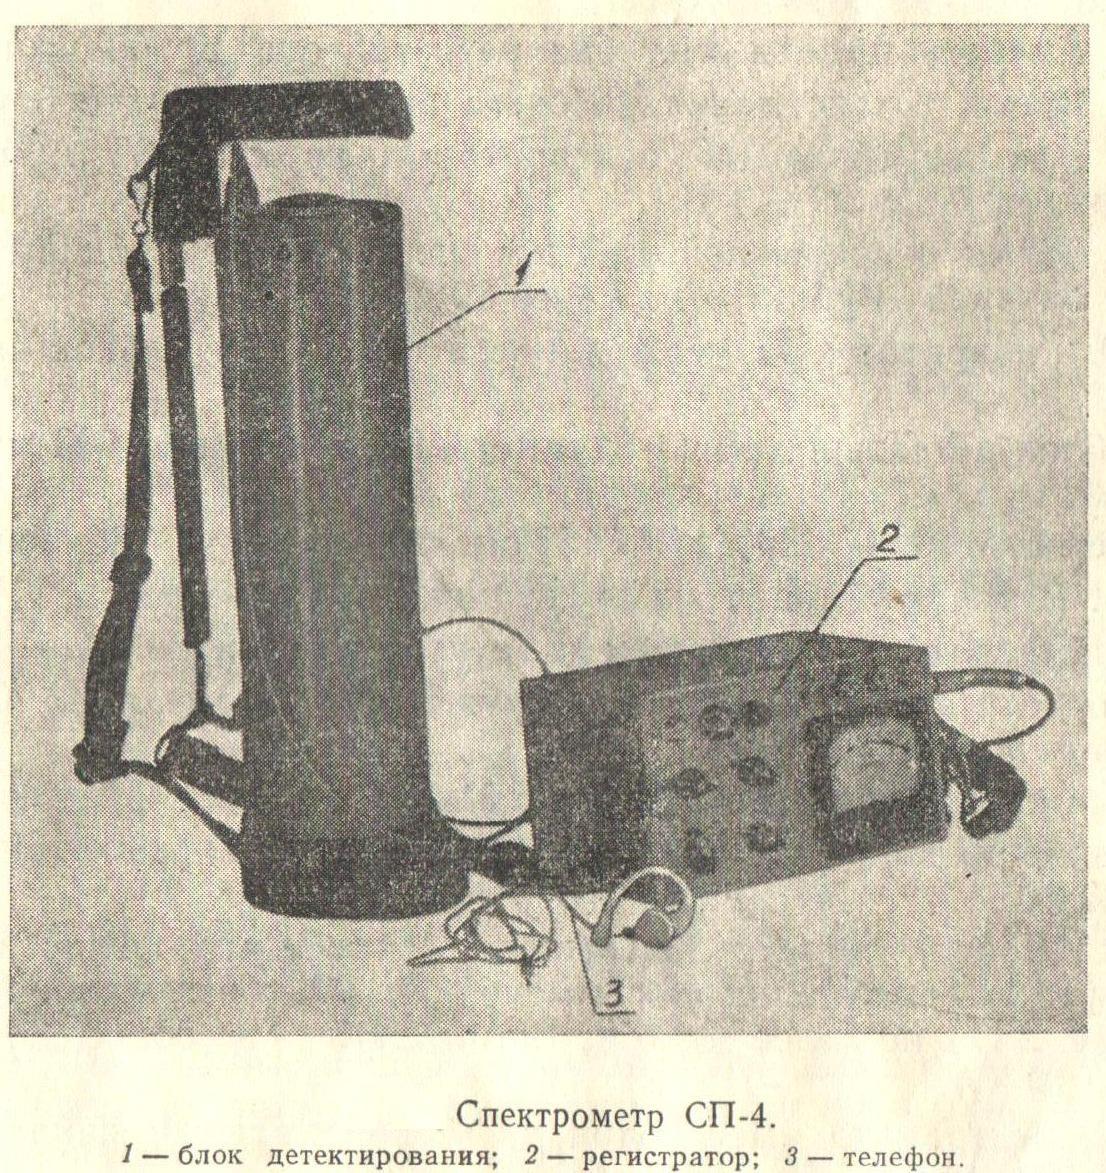 Спектрометр СП-4. SP-4 spectrometer